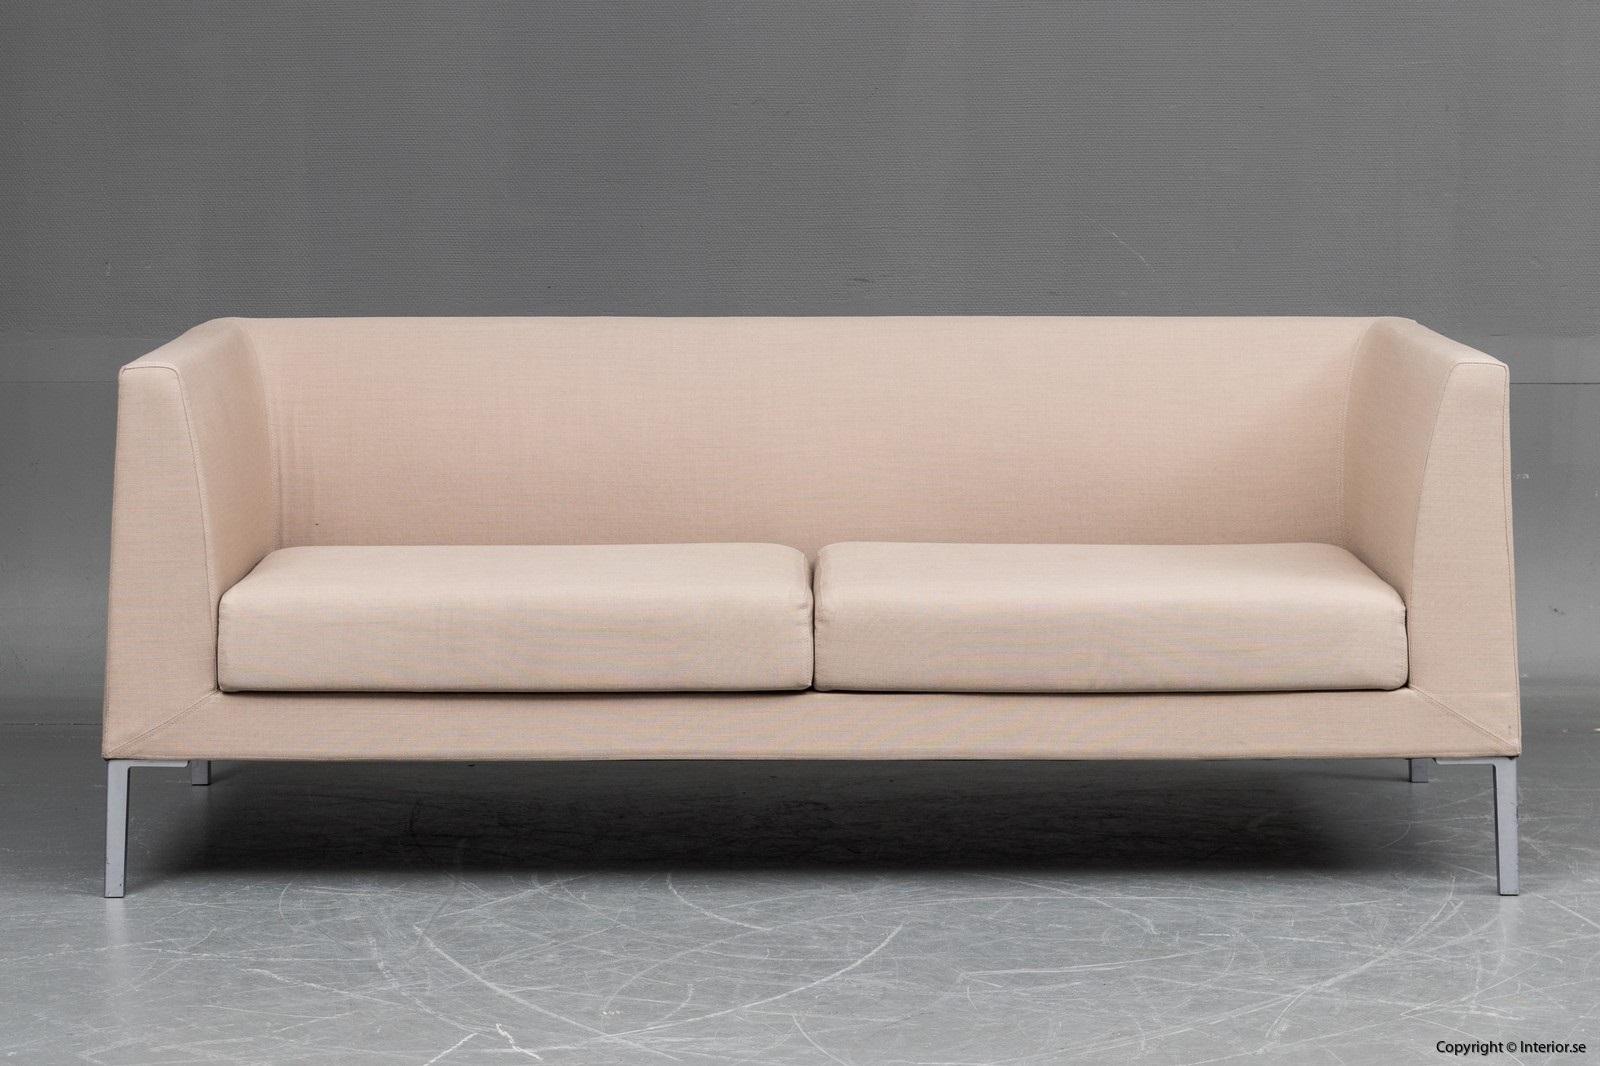 1 2-sits soffa, Paustian Eilersen Lounge - Hiorth Lorenzen & Foersom 2